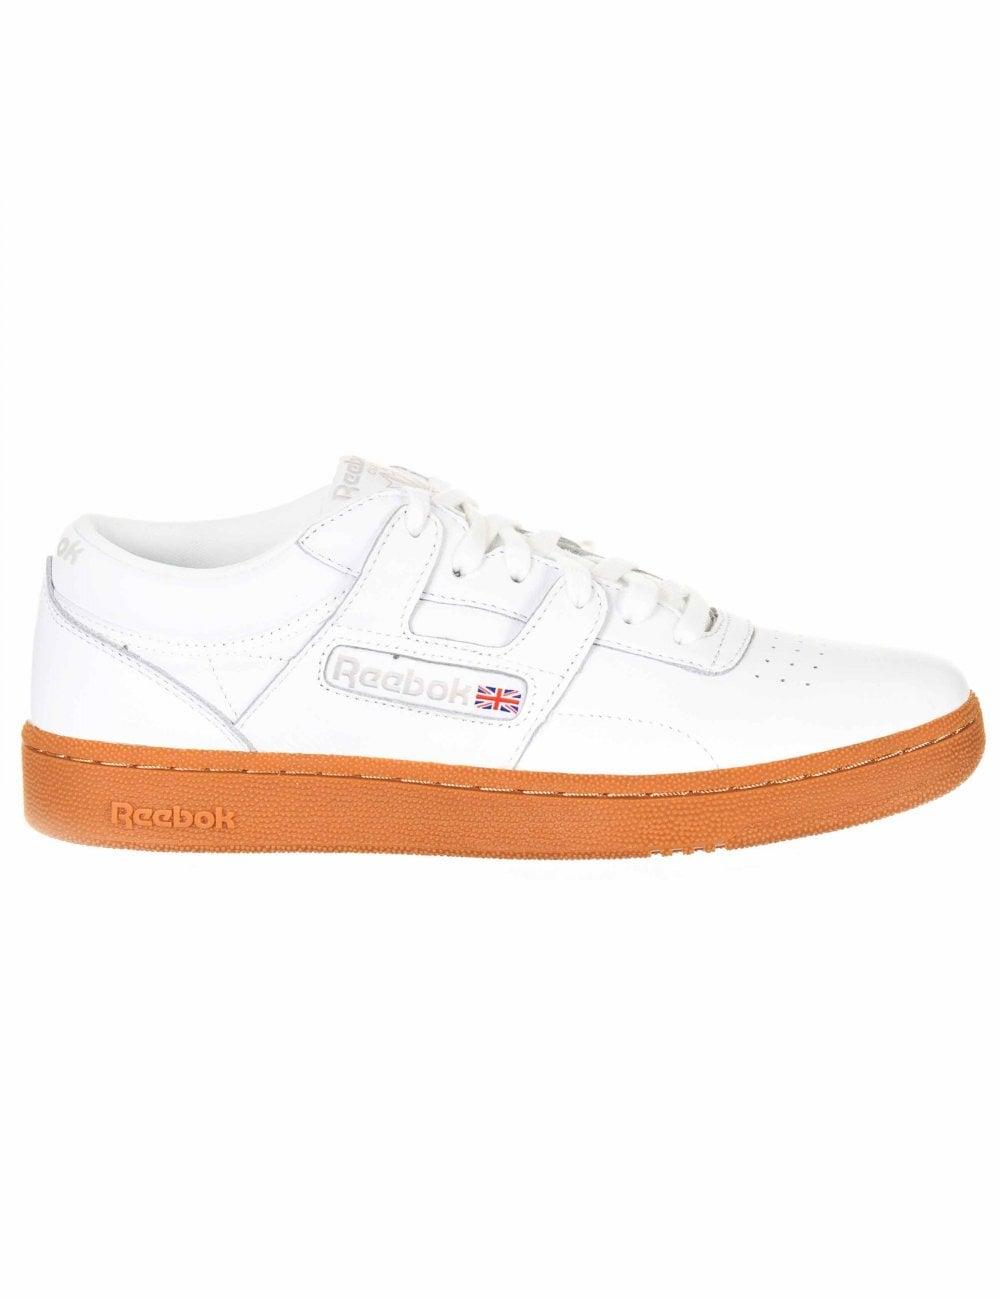 White//Skull Grey Reebok Club Workout MU Shoes